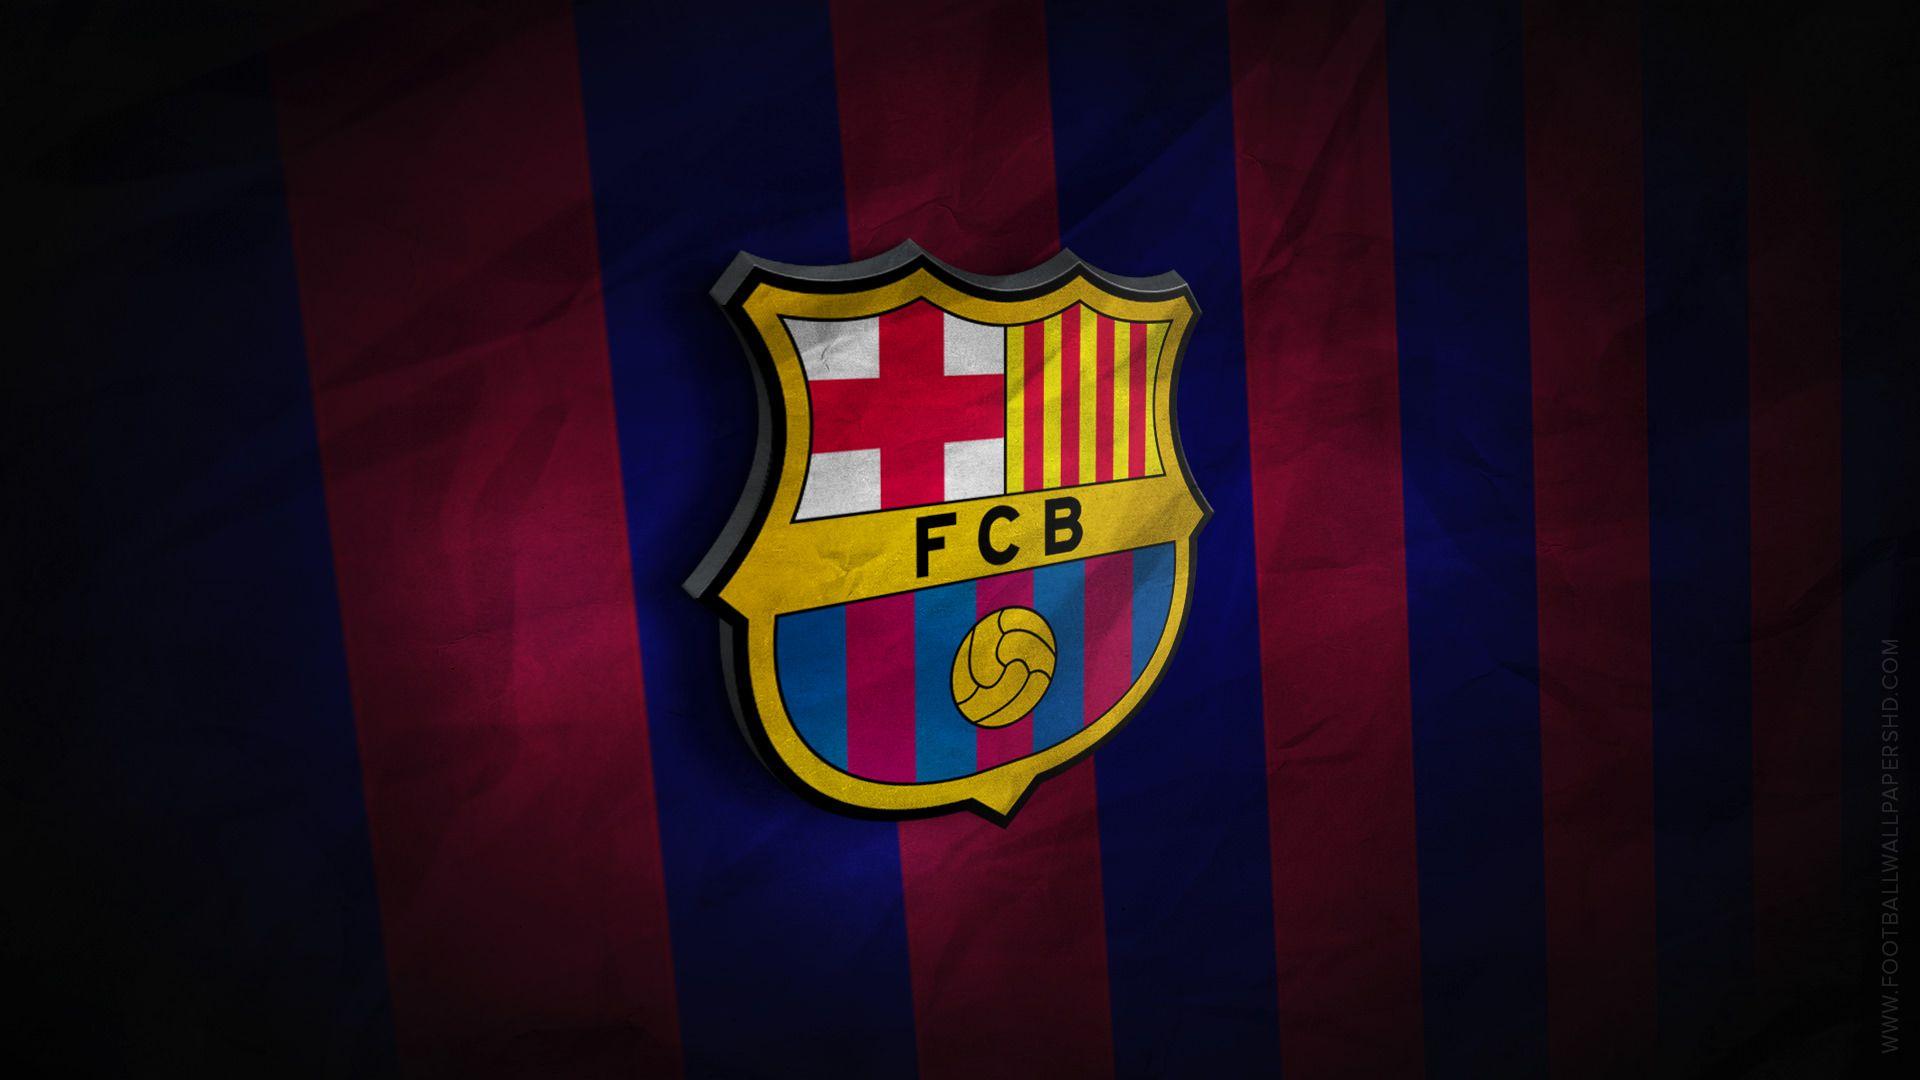 fc barcelona 3d logo wallpaper football wallpapers hd